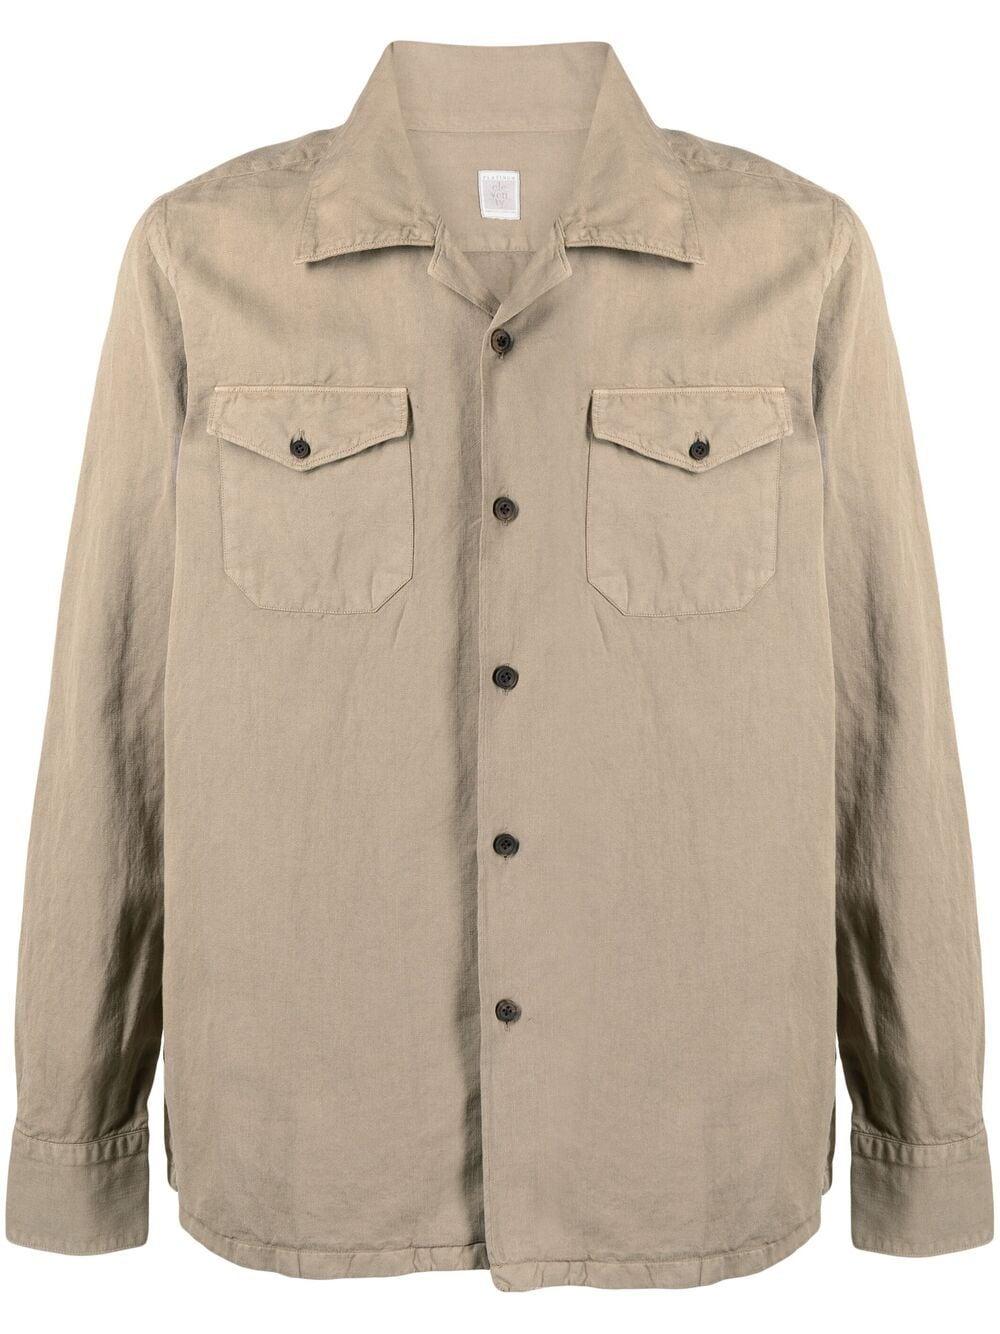 Khaki-beige cotton long-sleeved cotton shirt  ELEVENTY |  | C75CAMC05-TES0C01202